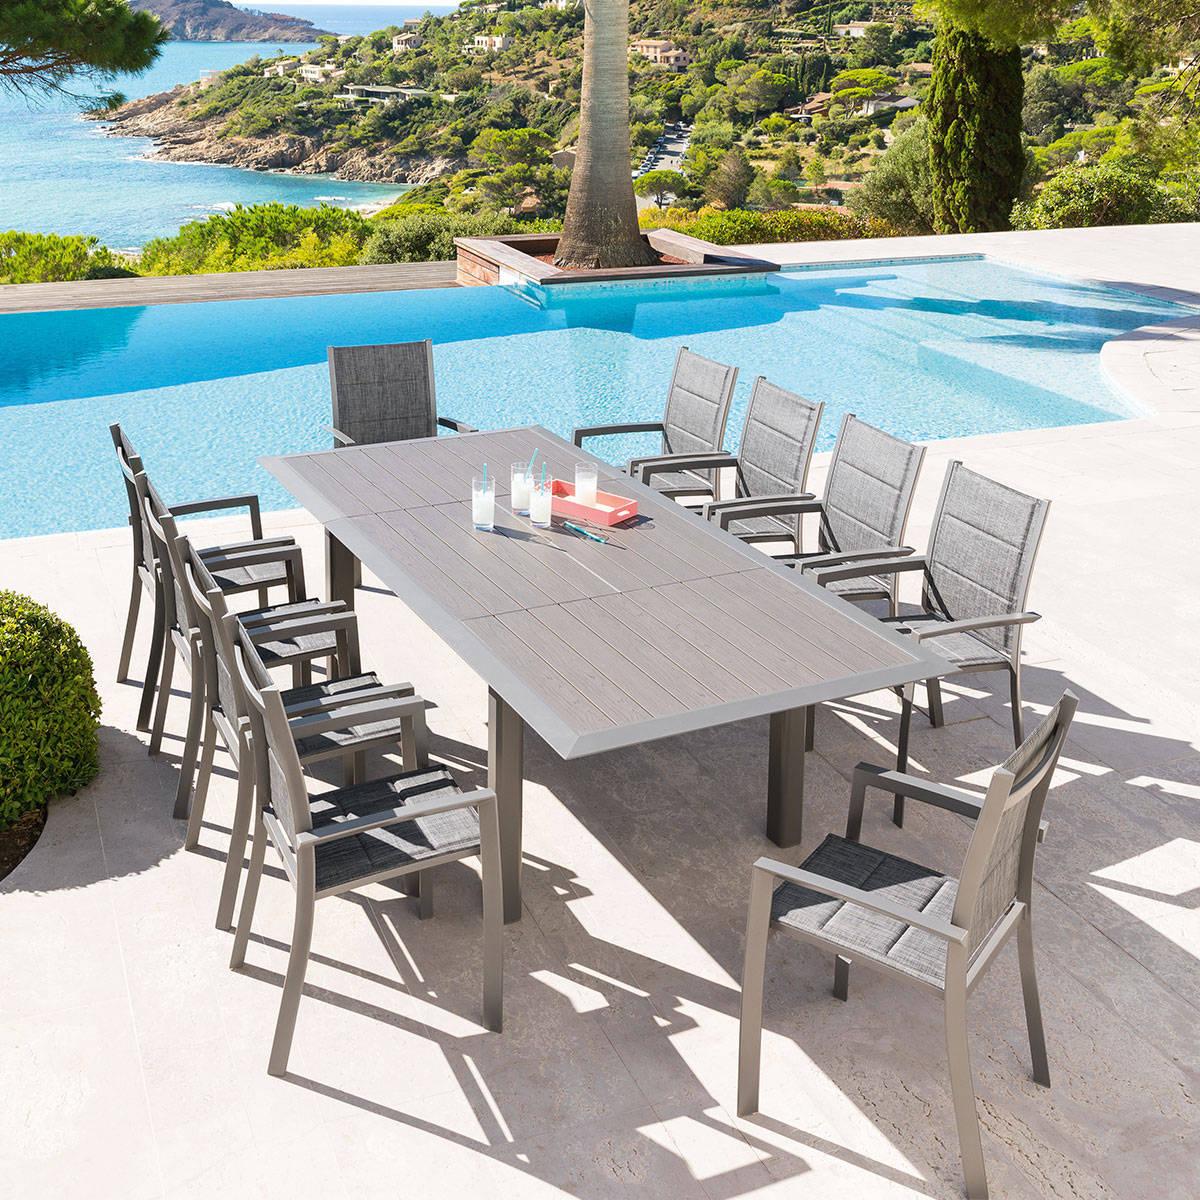 Table Extensible Allure Alu Gris/mastic - 10 Places concernant Table Jardin Hesperide